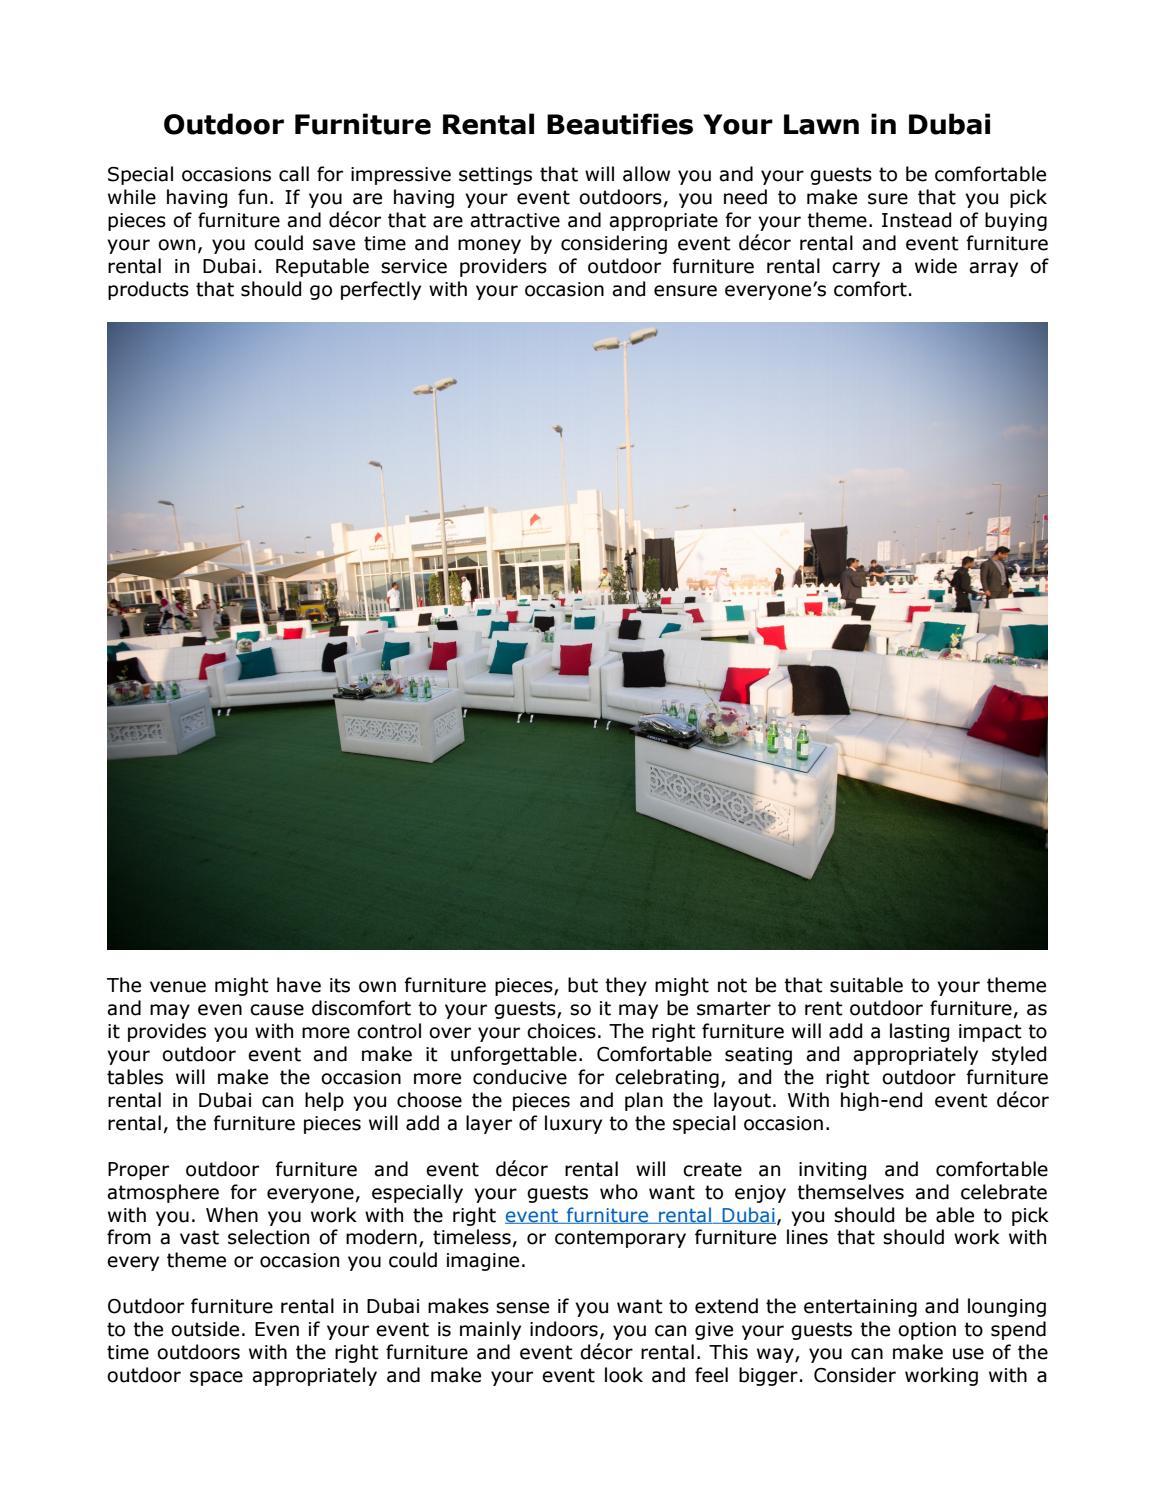 Outdoor Furniture Rental Beautifies Your Lawn In Dubai By Areeka Event Rentals Dubai Issuu